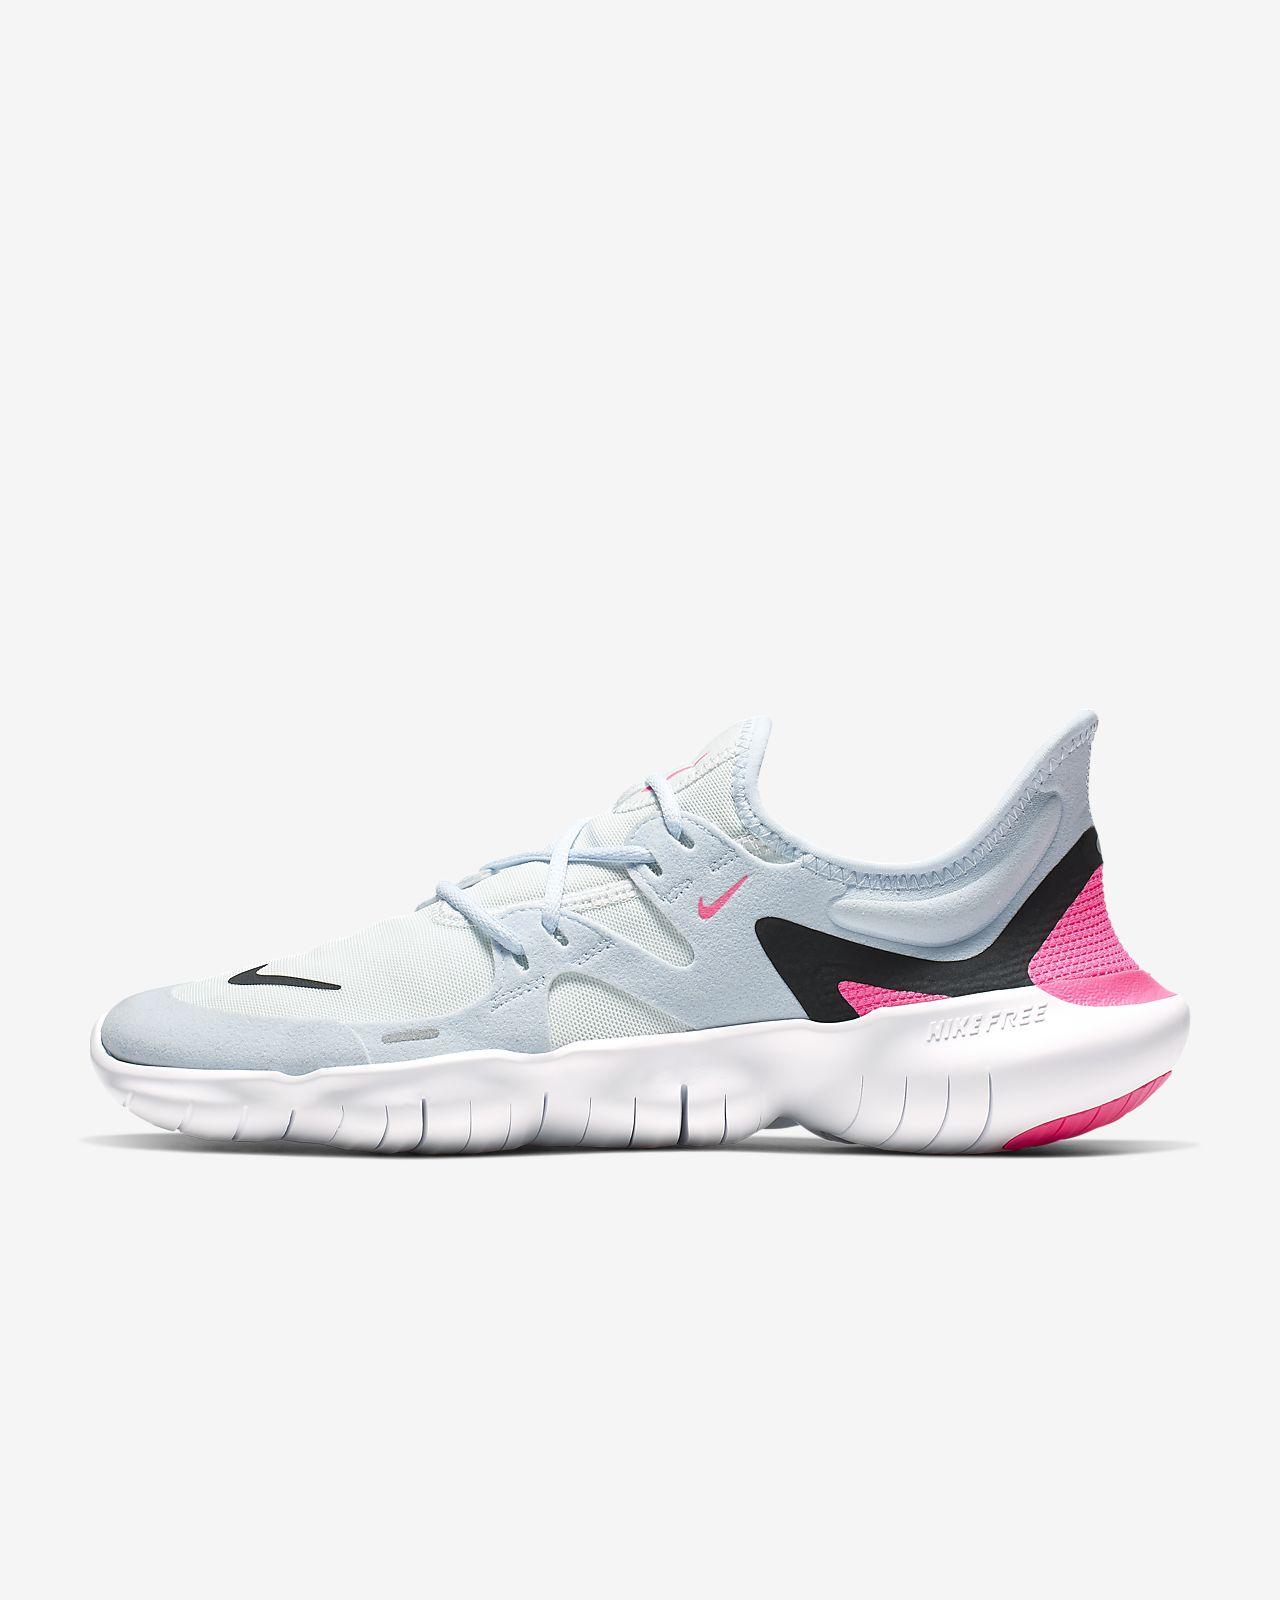 Nike Free RN 5.0 női futócipő